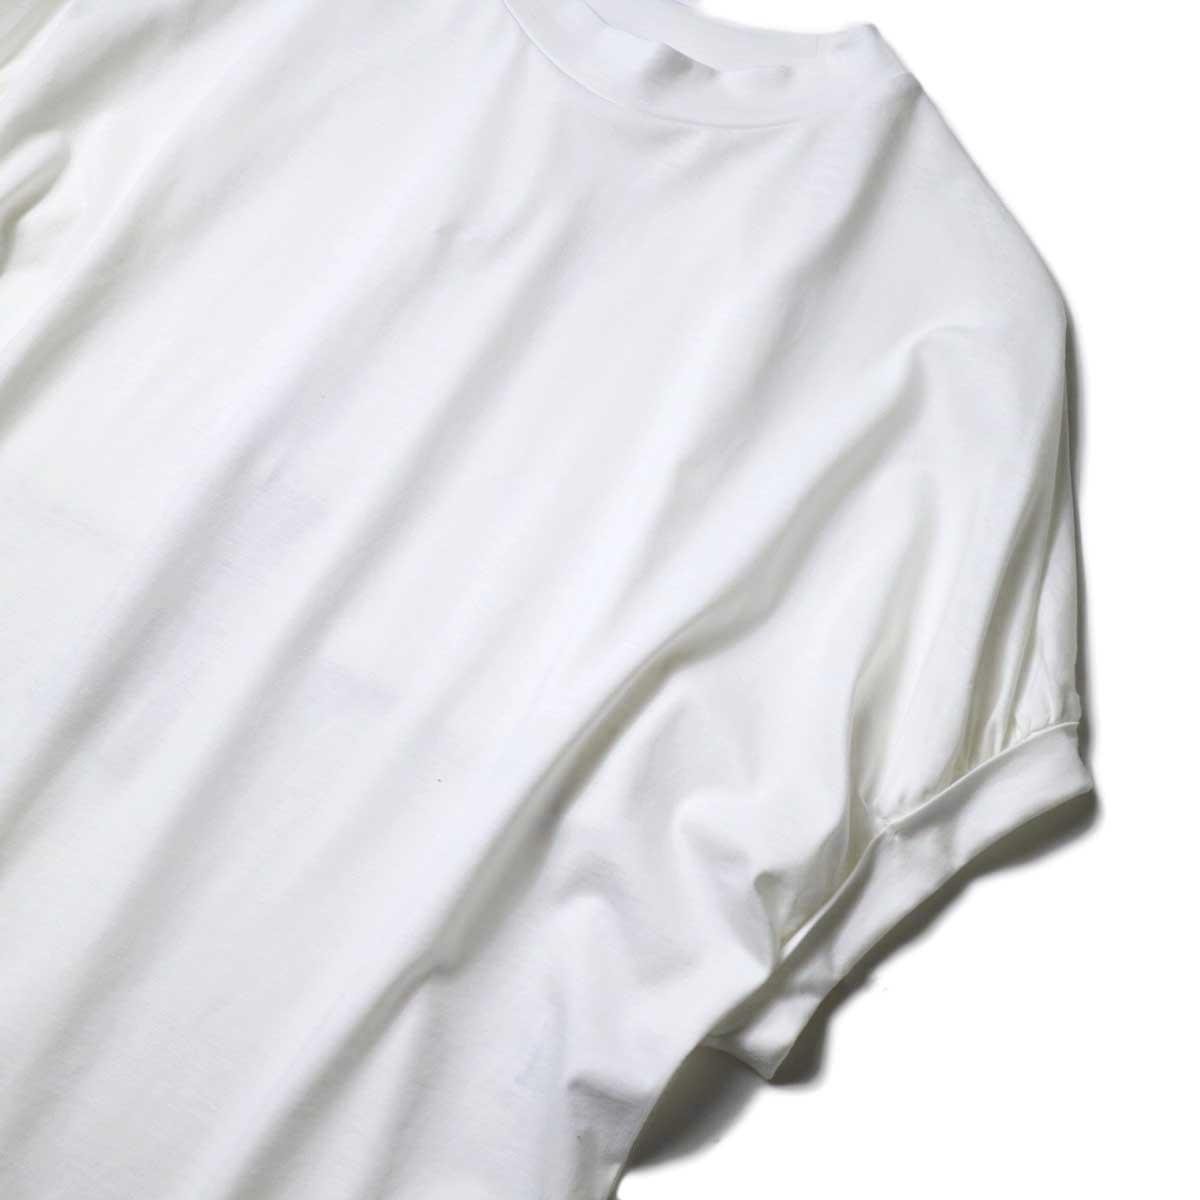 WHYTO. / ギャザースリーブカットソー (Off White) 袖